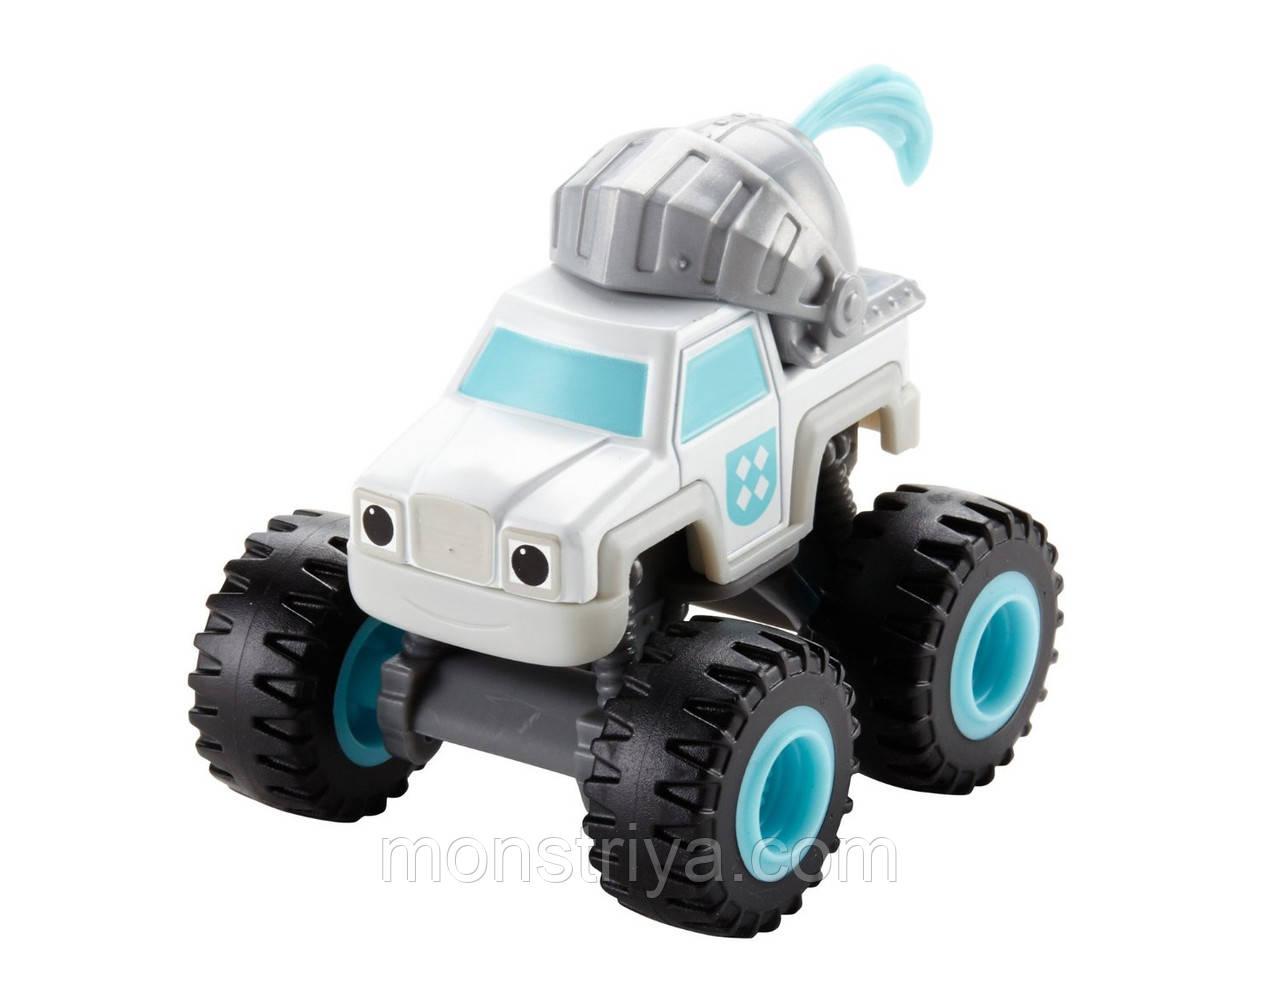 Машинка Knight Truck Вспыш и Чудо-машинки